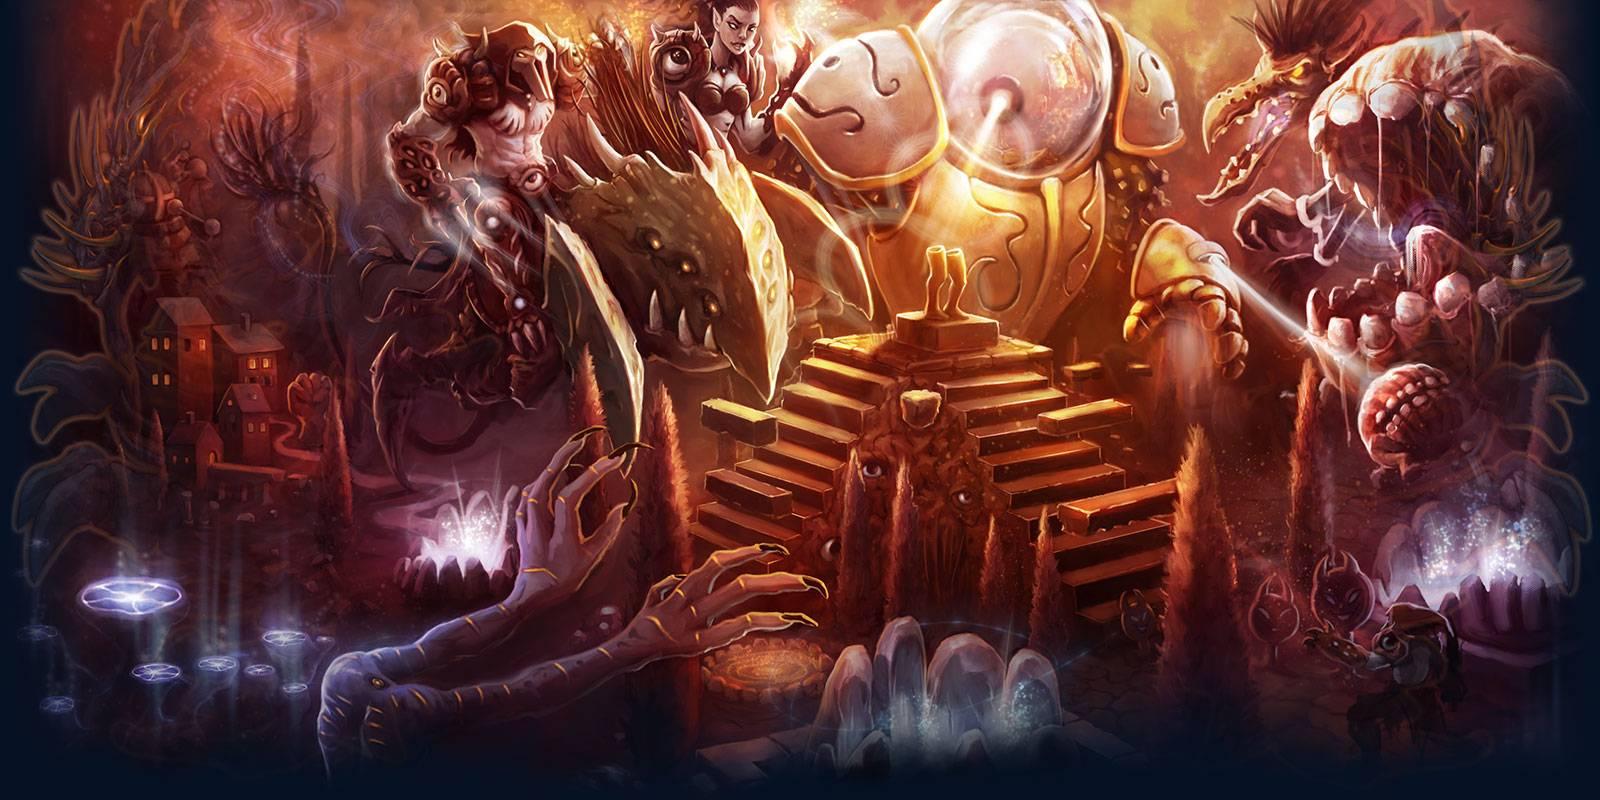 Fallout 4 Wallpaper Hd Tibia Wallpapers